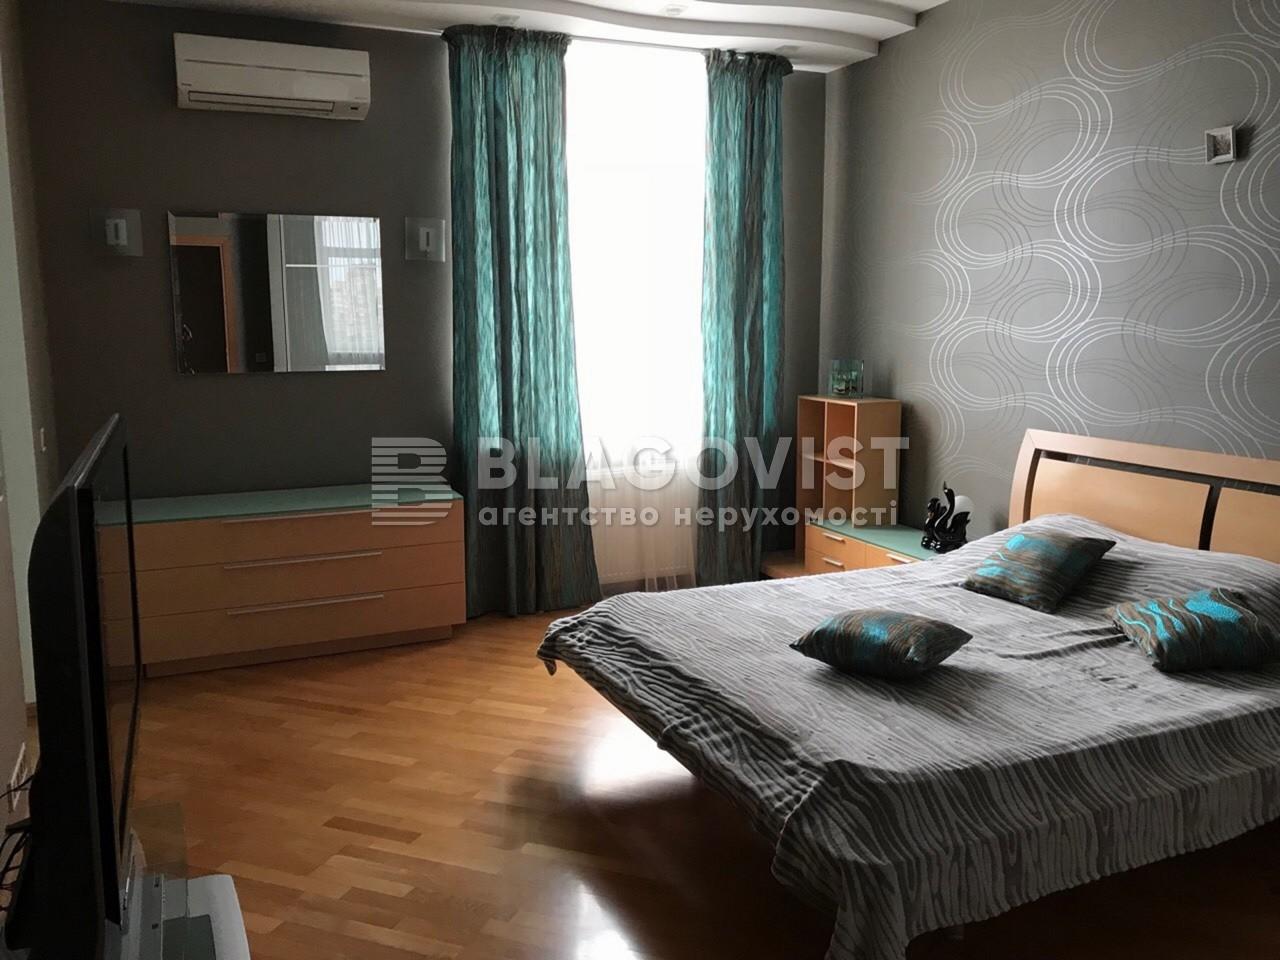 Квартира R-25404, Старонаводницкая, 13, Киев - Фото 9